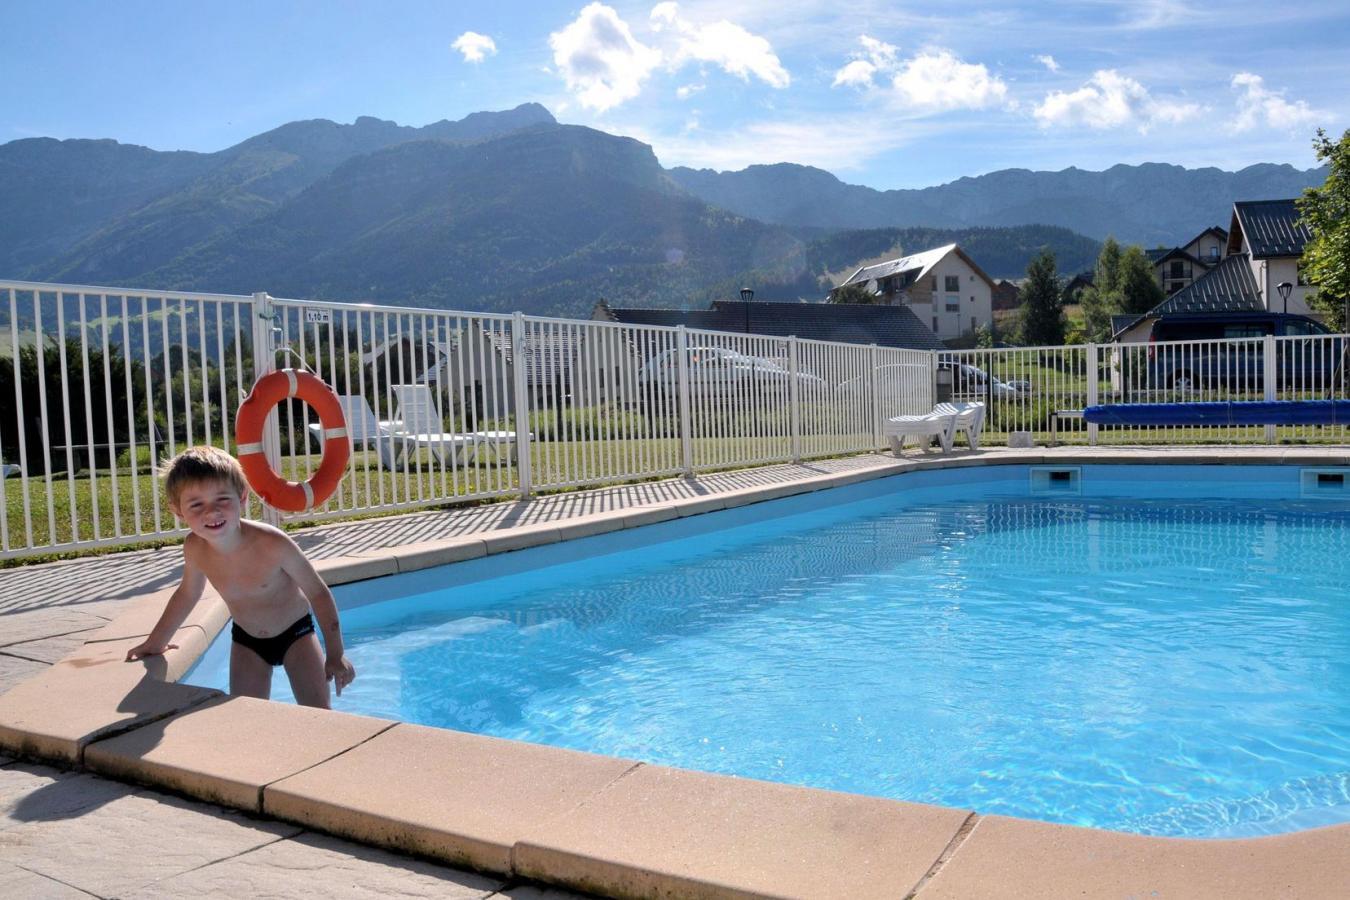 Residence la croix margot 25 villard de lans location - Villard de lans piscine ...